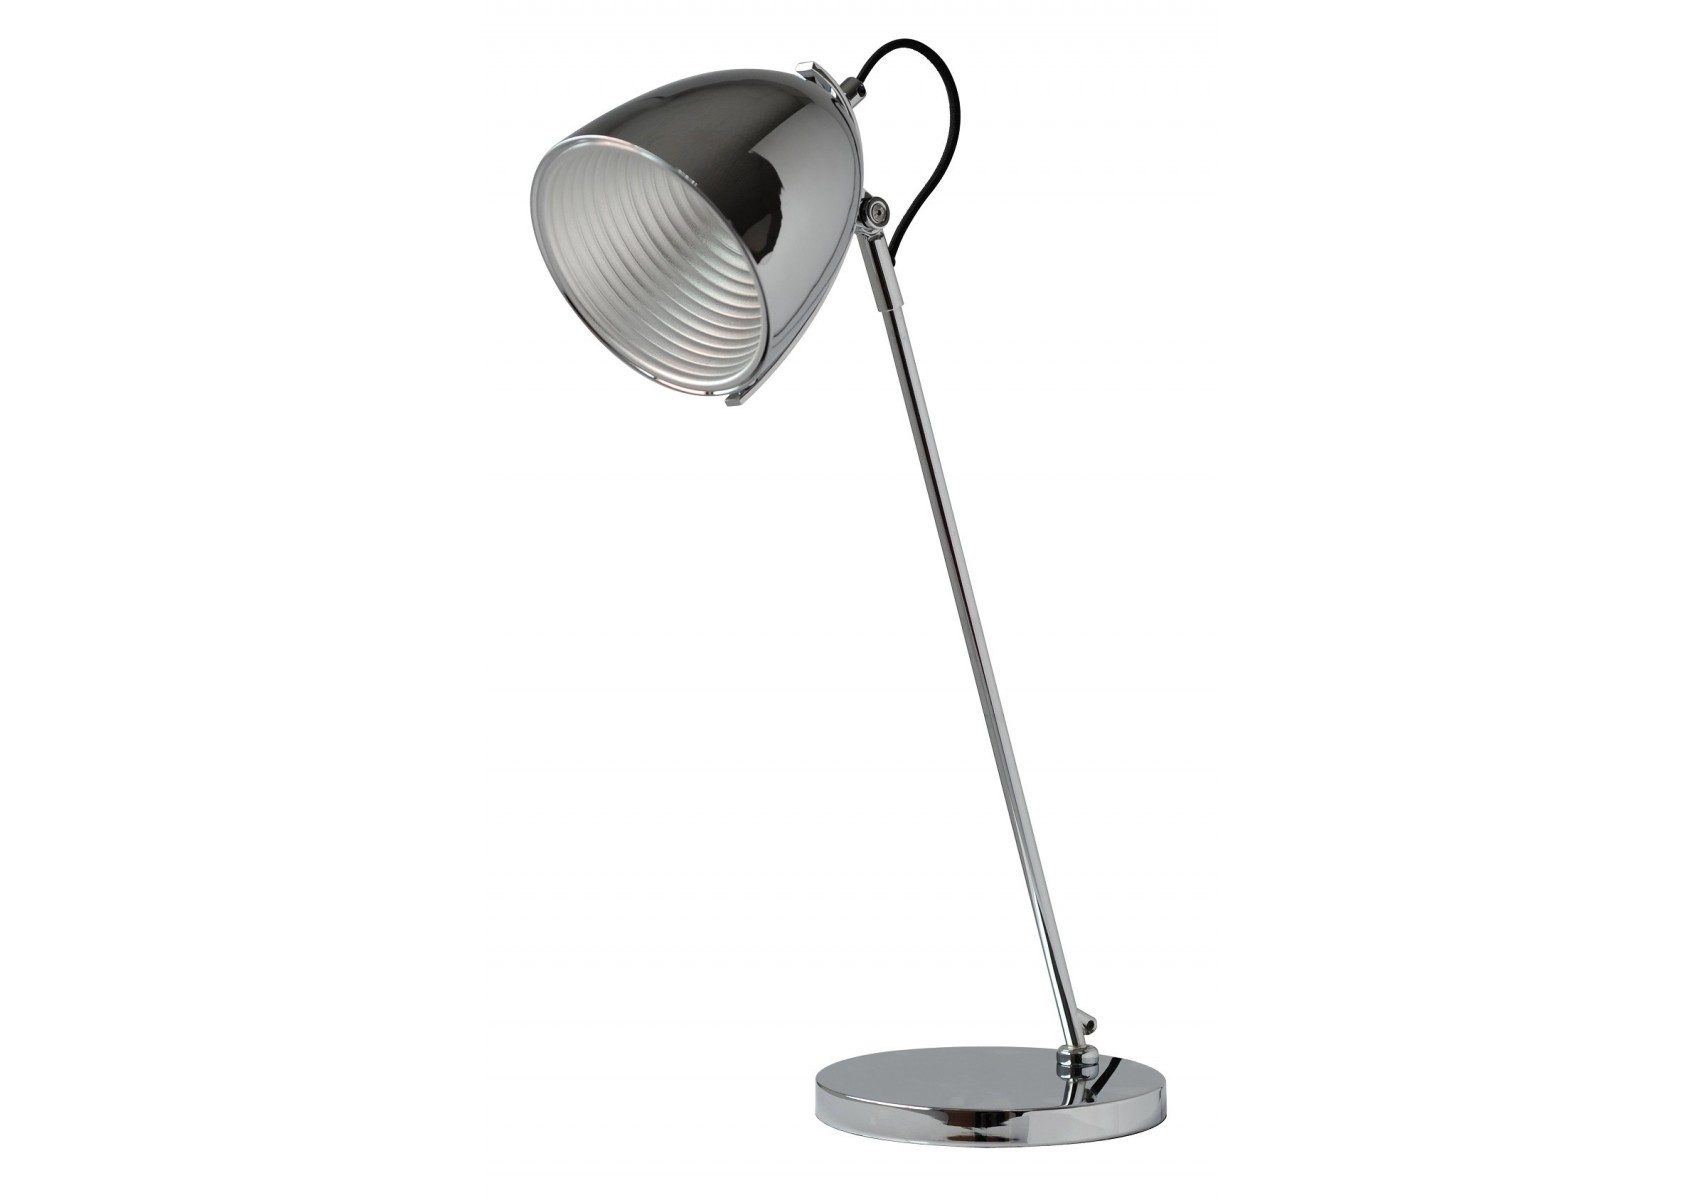 Lampe de bureau style industriel ines lt chrome boite - Lampe de bureau style industriel ...